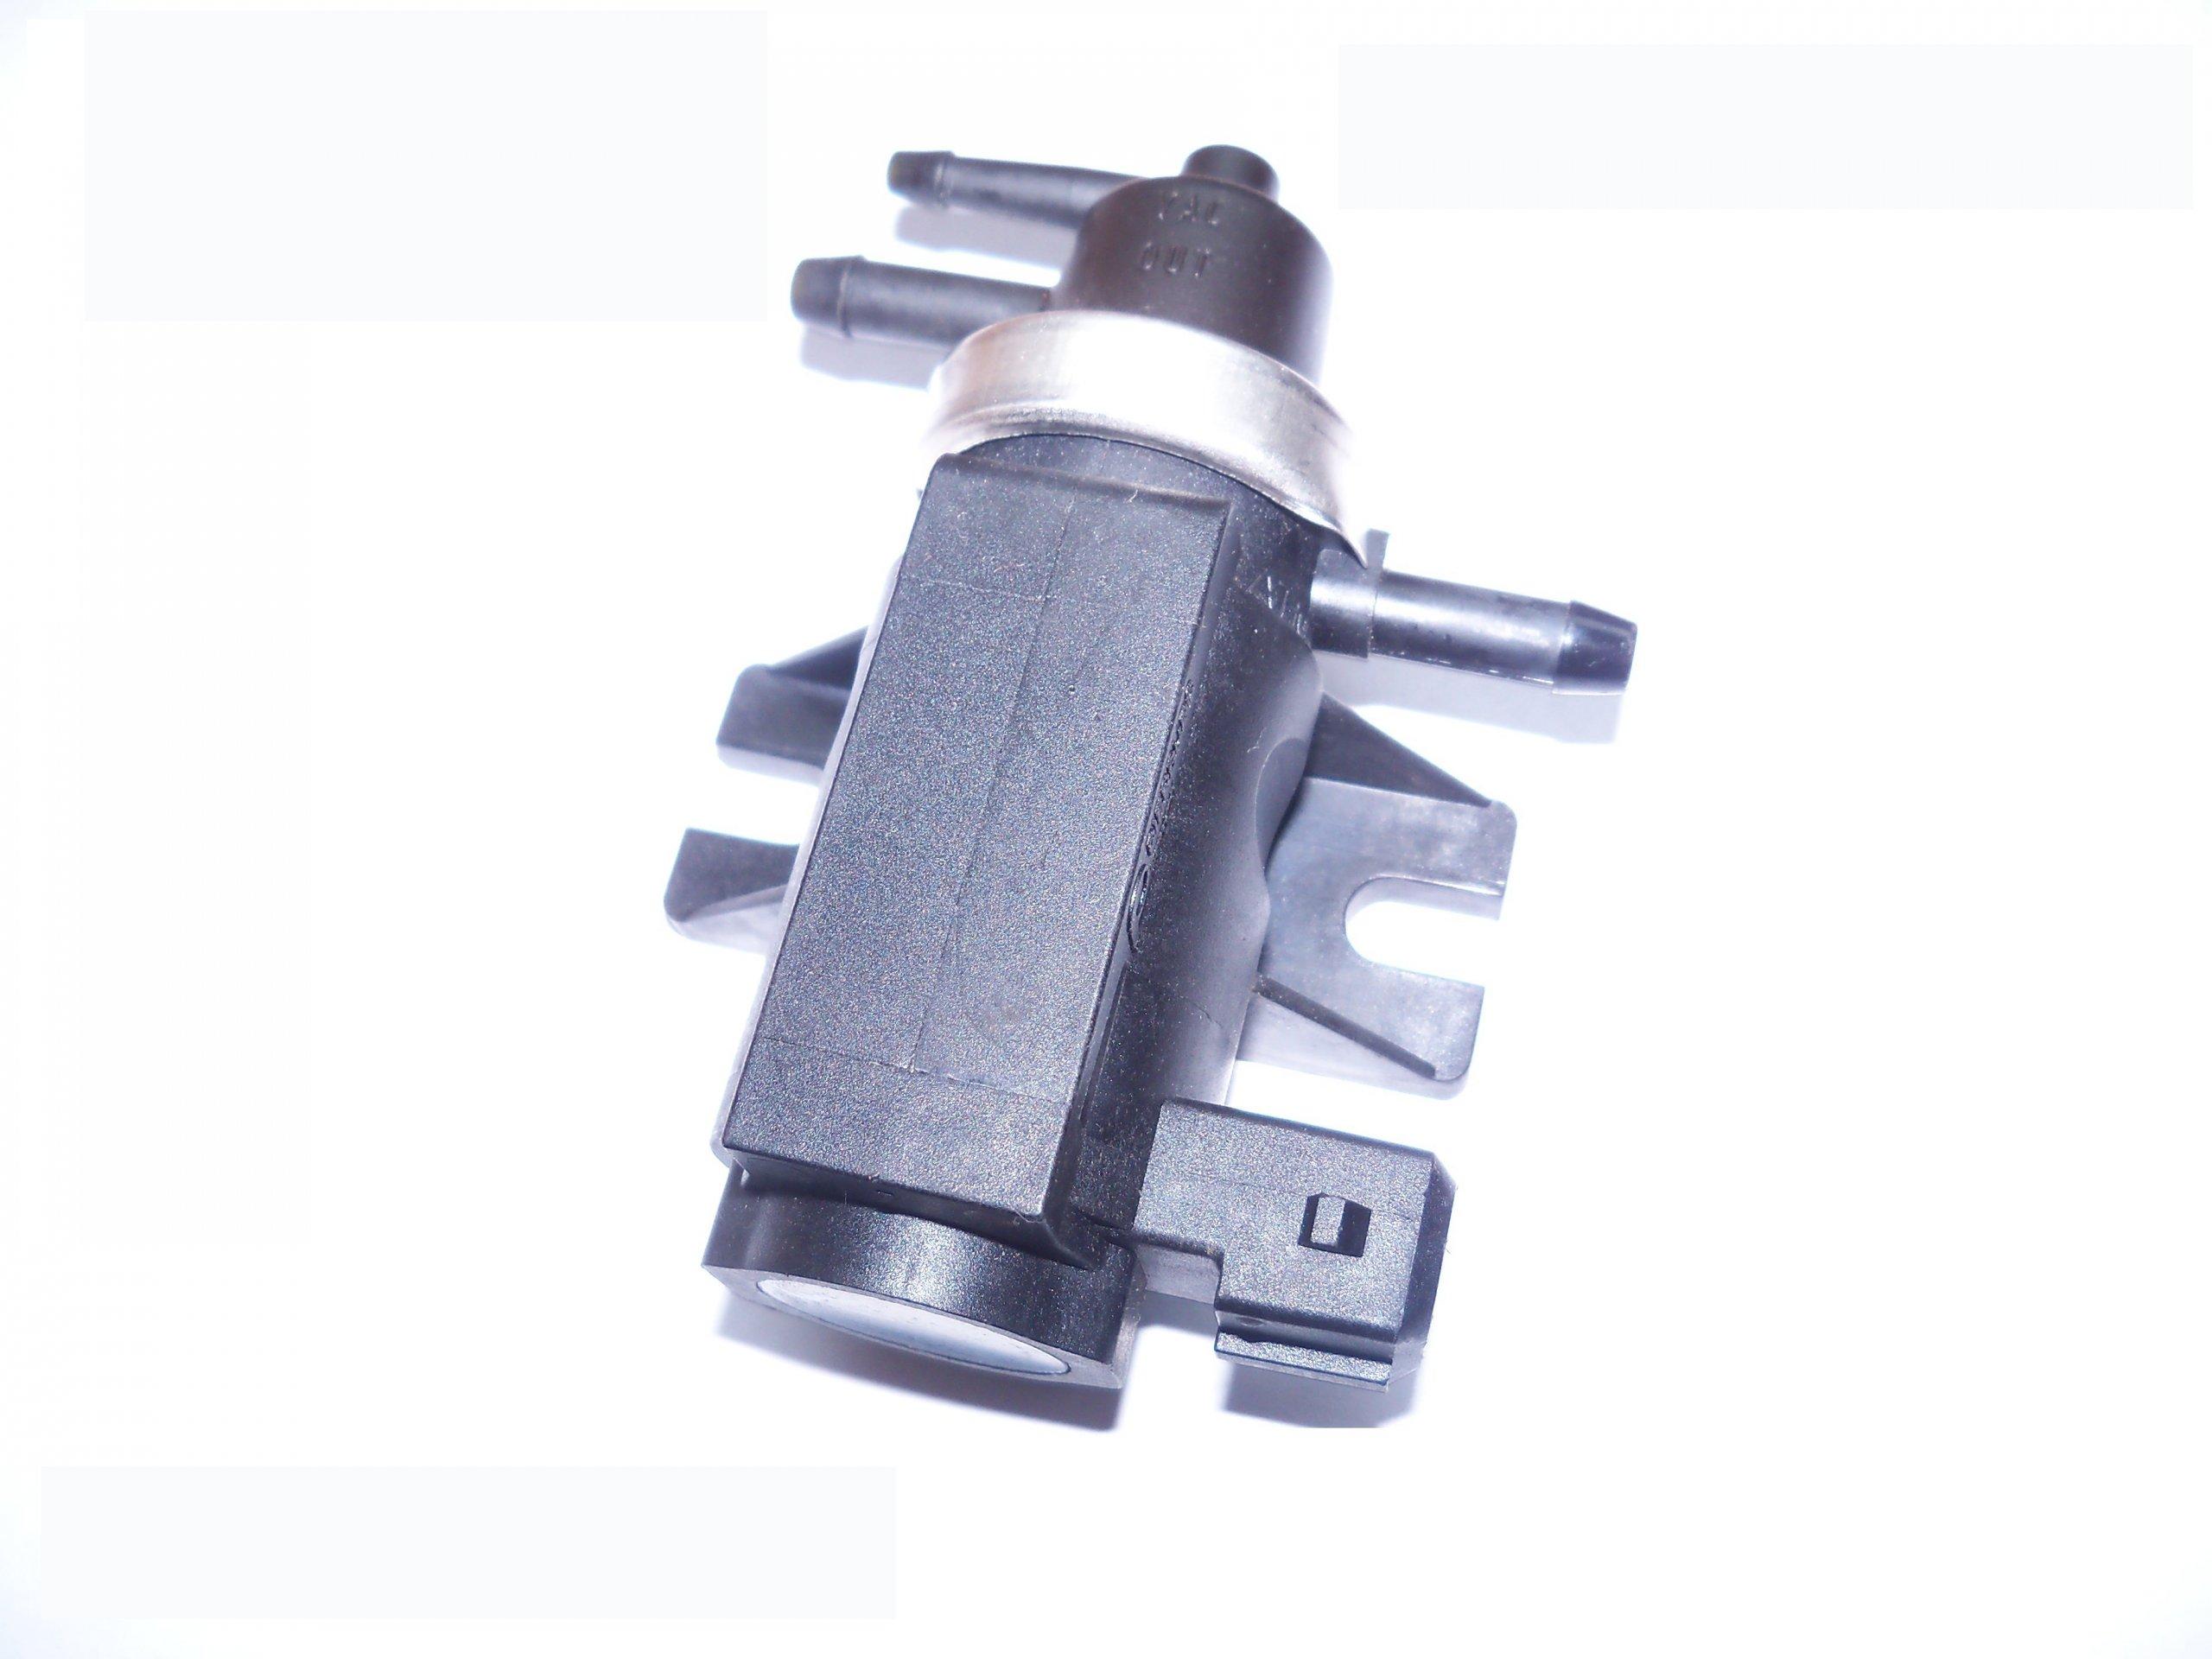 клапан датчик турбины volvo s40 v40 19di 99r-2004